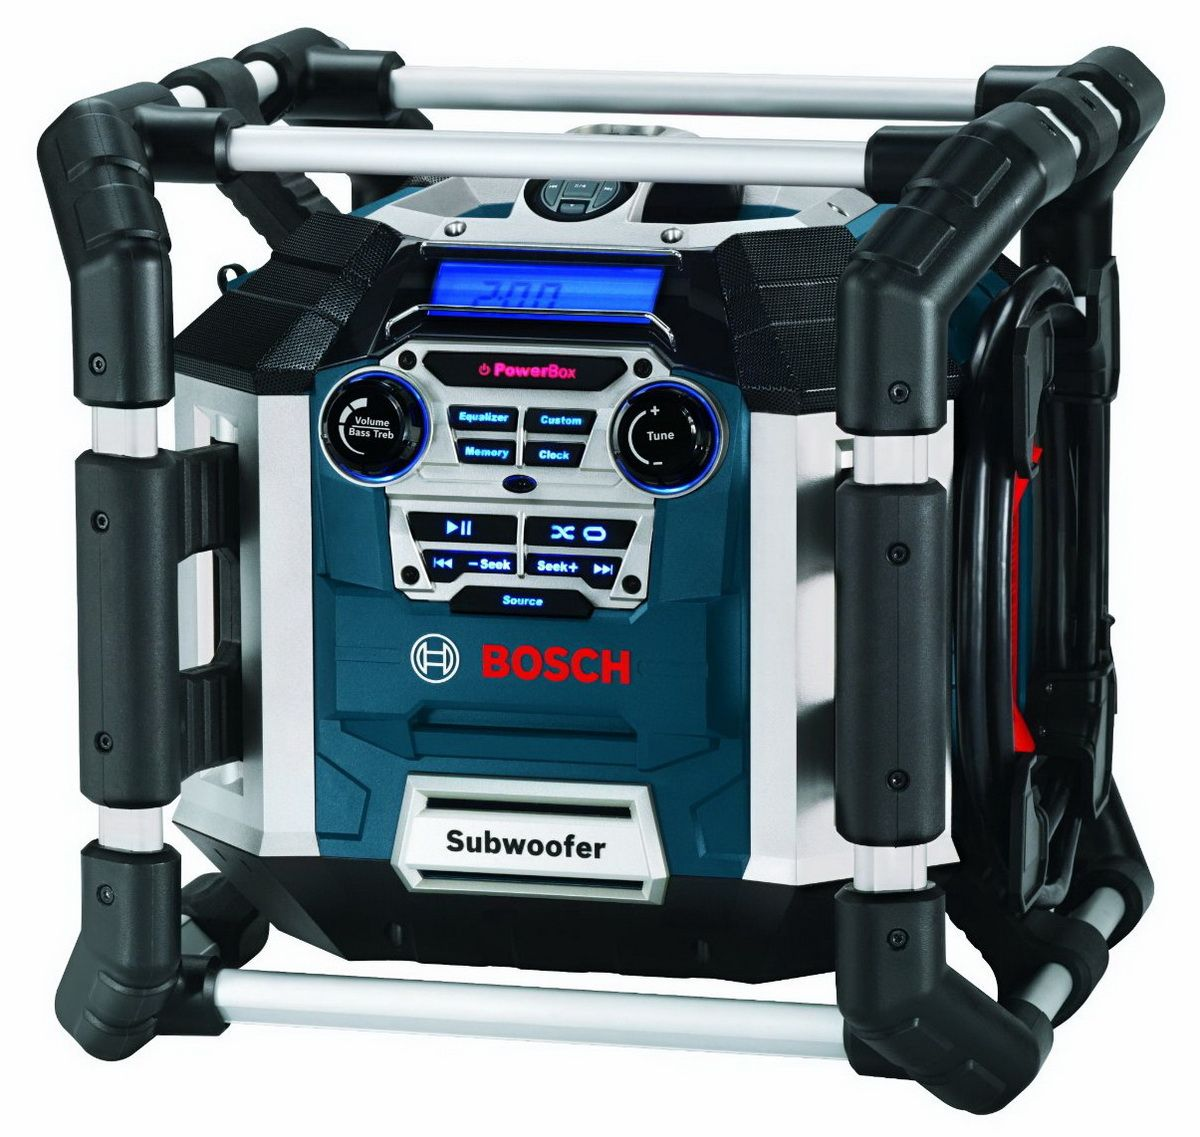 Bosch GML SoundBOXX Jobsite Radio 14.4-18V Li-ion